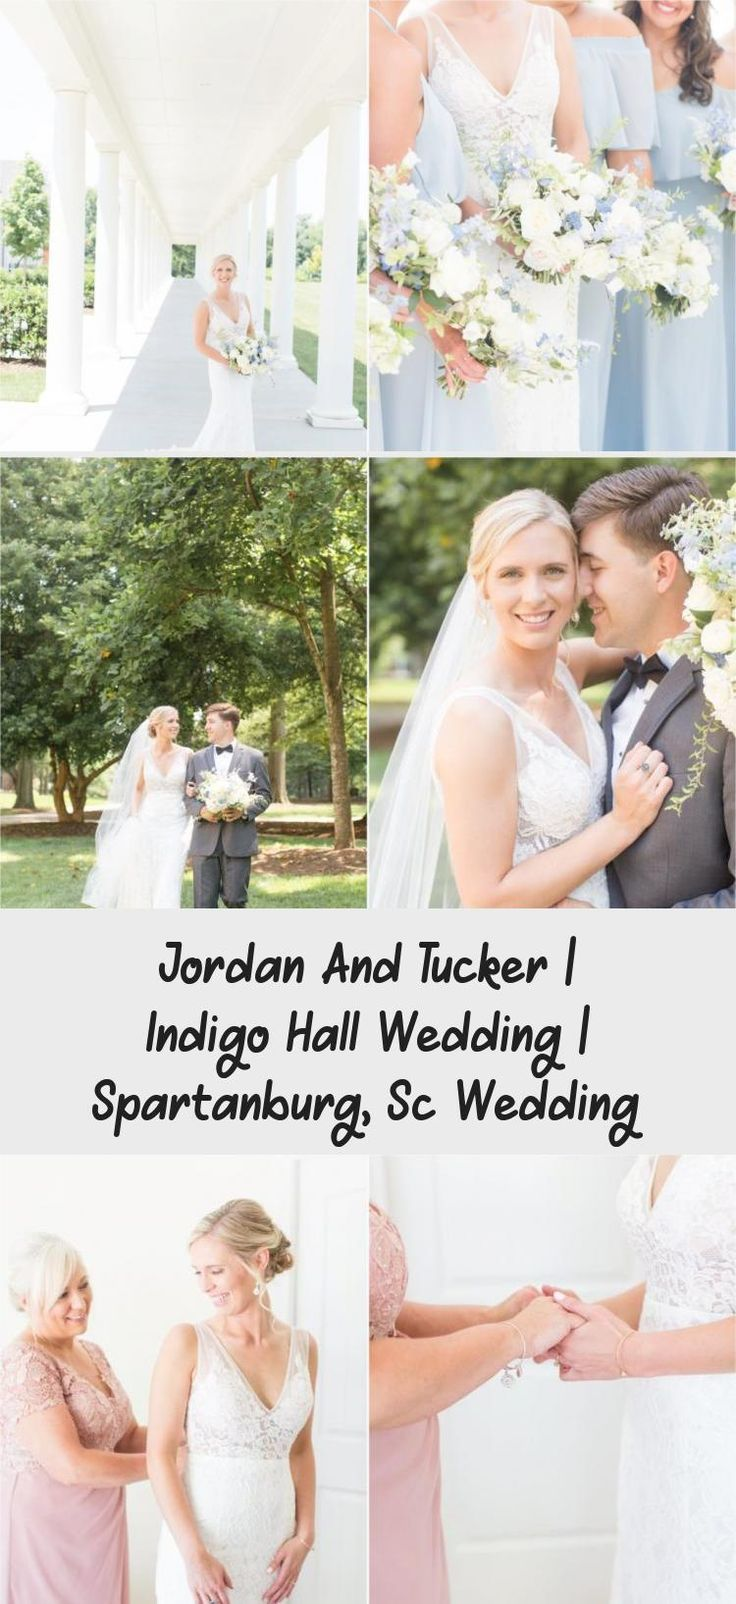 Indigo Hall Spartanburg Wedding | Greenville, SC Wedding Photographer | Christa Rene Photography #OffTheShoulderBridesmaidDresses #BridesmaidDressesShort #BridesmaidDressesTwoPiece #MaroonBridesmaidDresses #BridesmaidDressesMidi